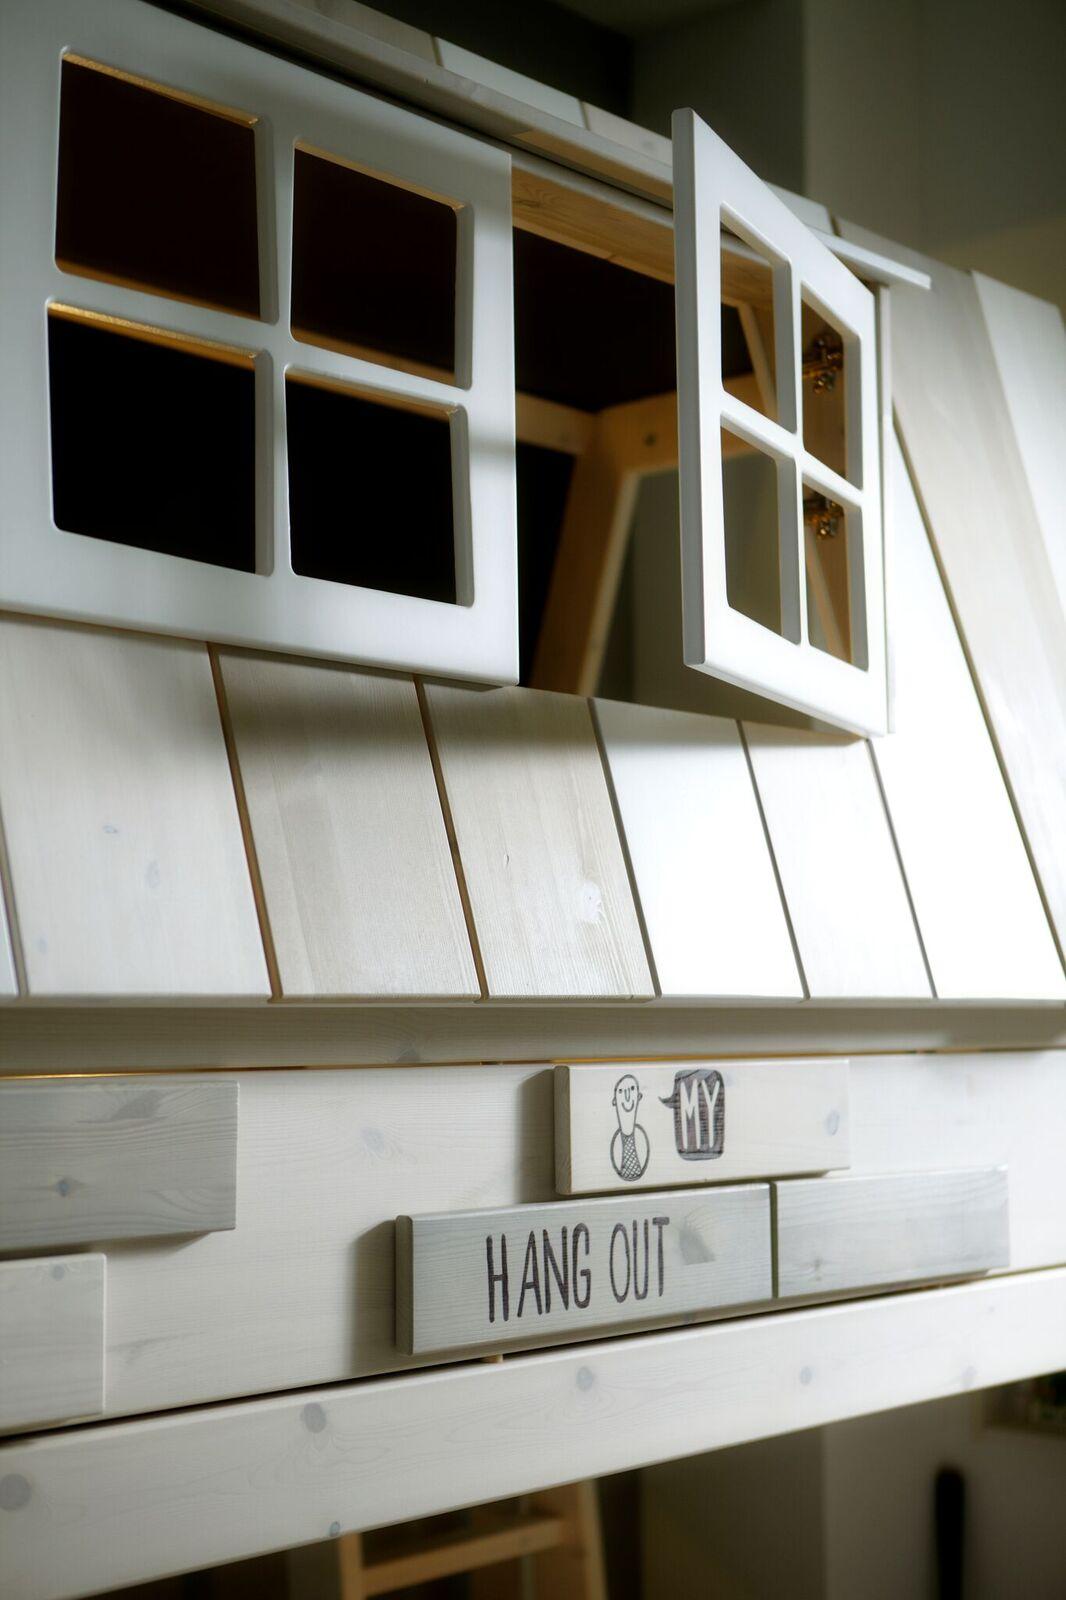 Abenteuerbett Hangout 90*200 cm whitewash LIFETIME inklusive Dachkonstruktion